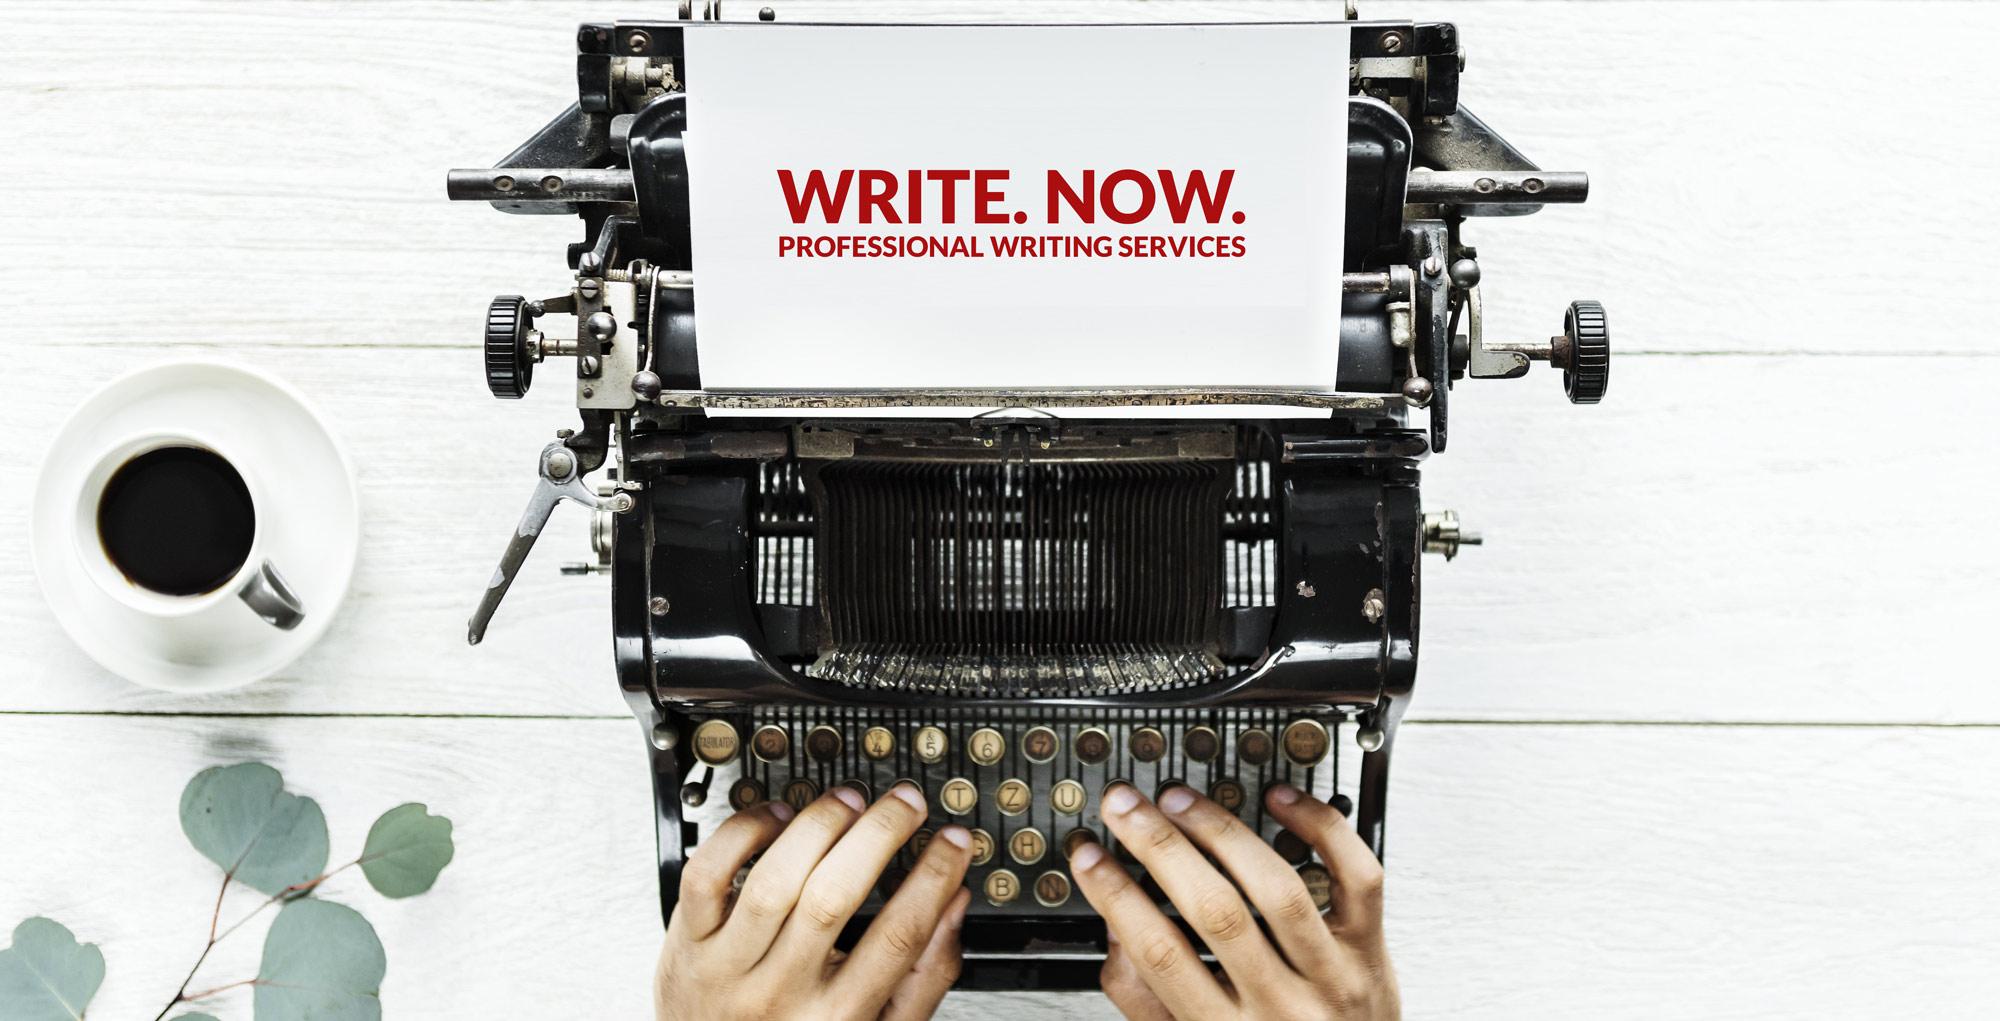 write-now-header-graphic-2